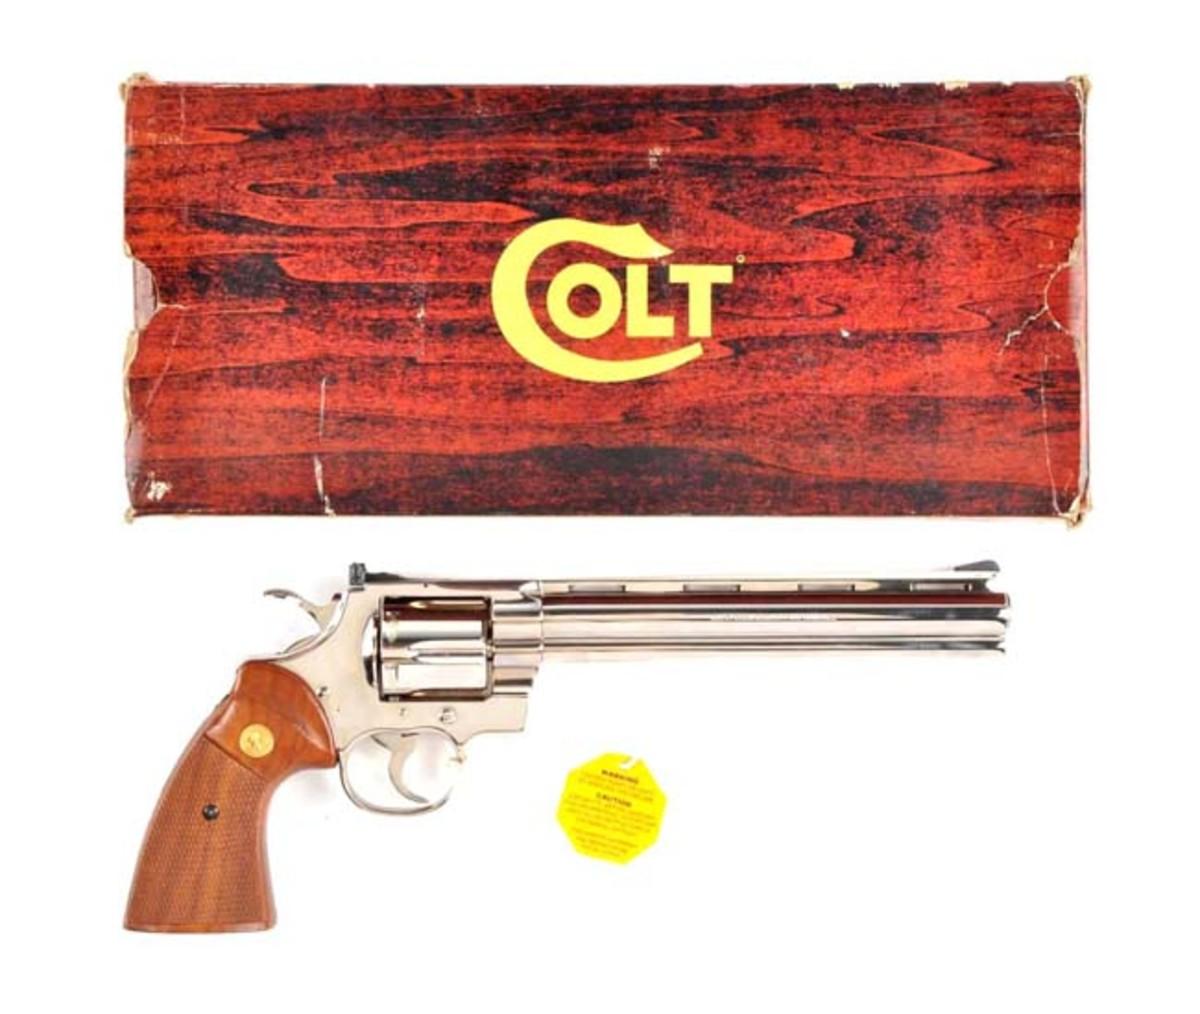 Boxed Colt Nickel Python Target